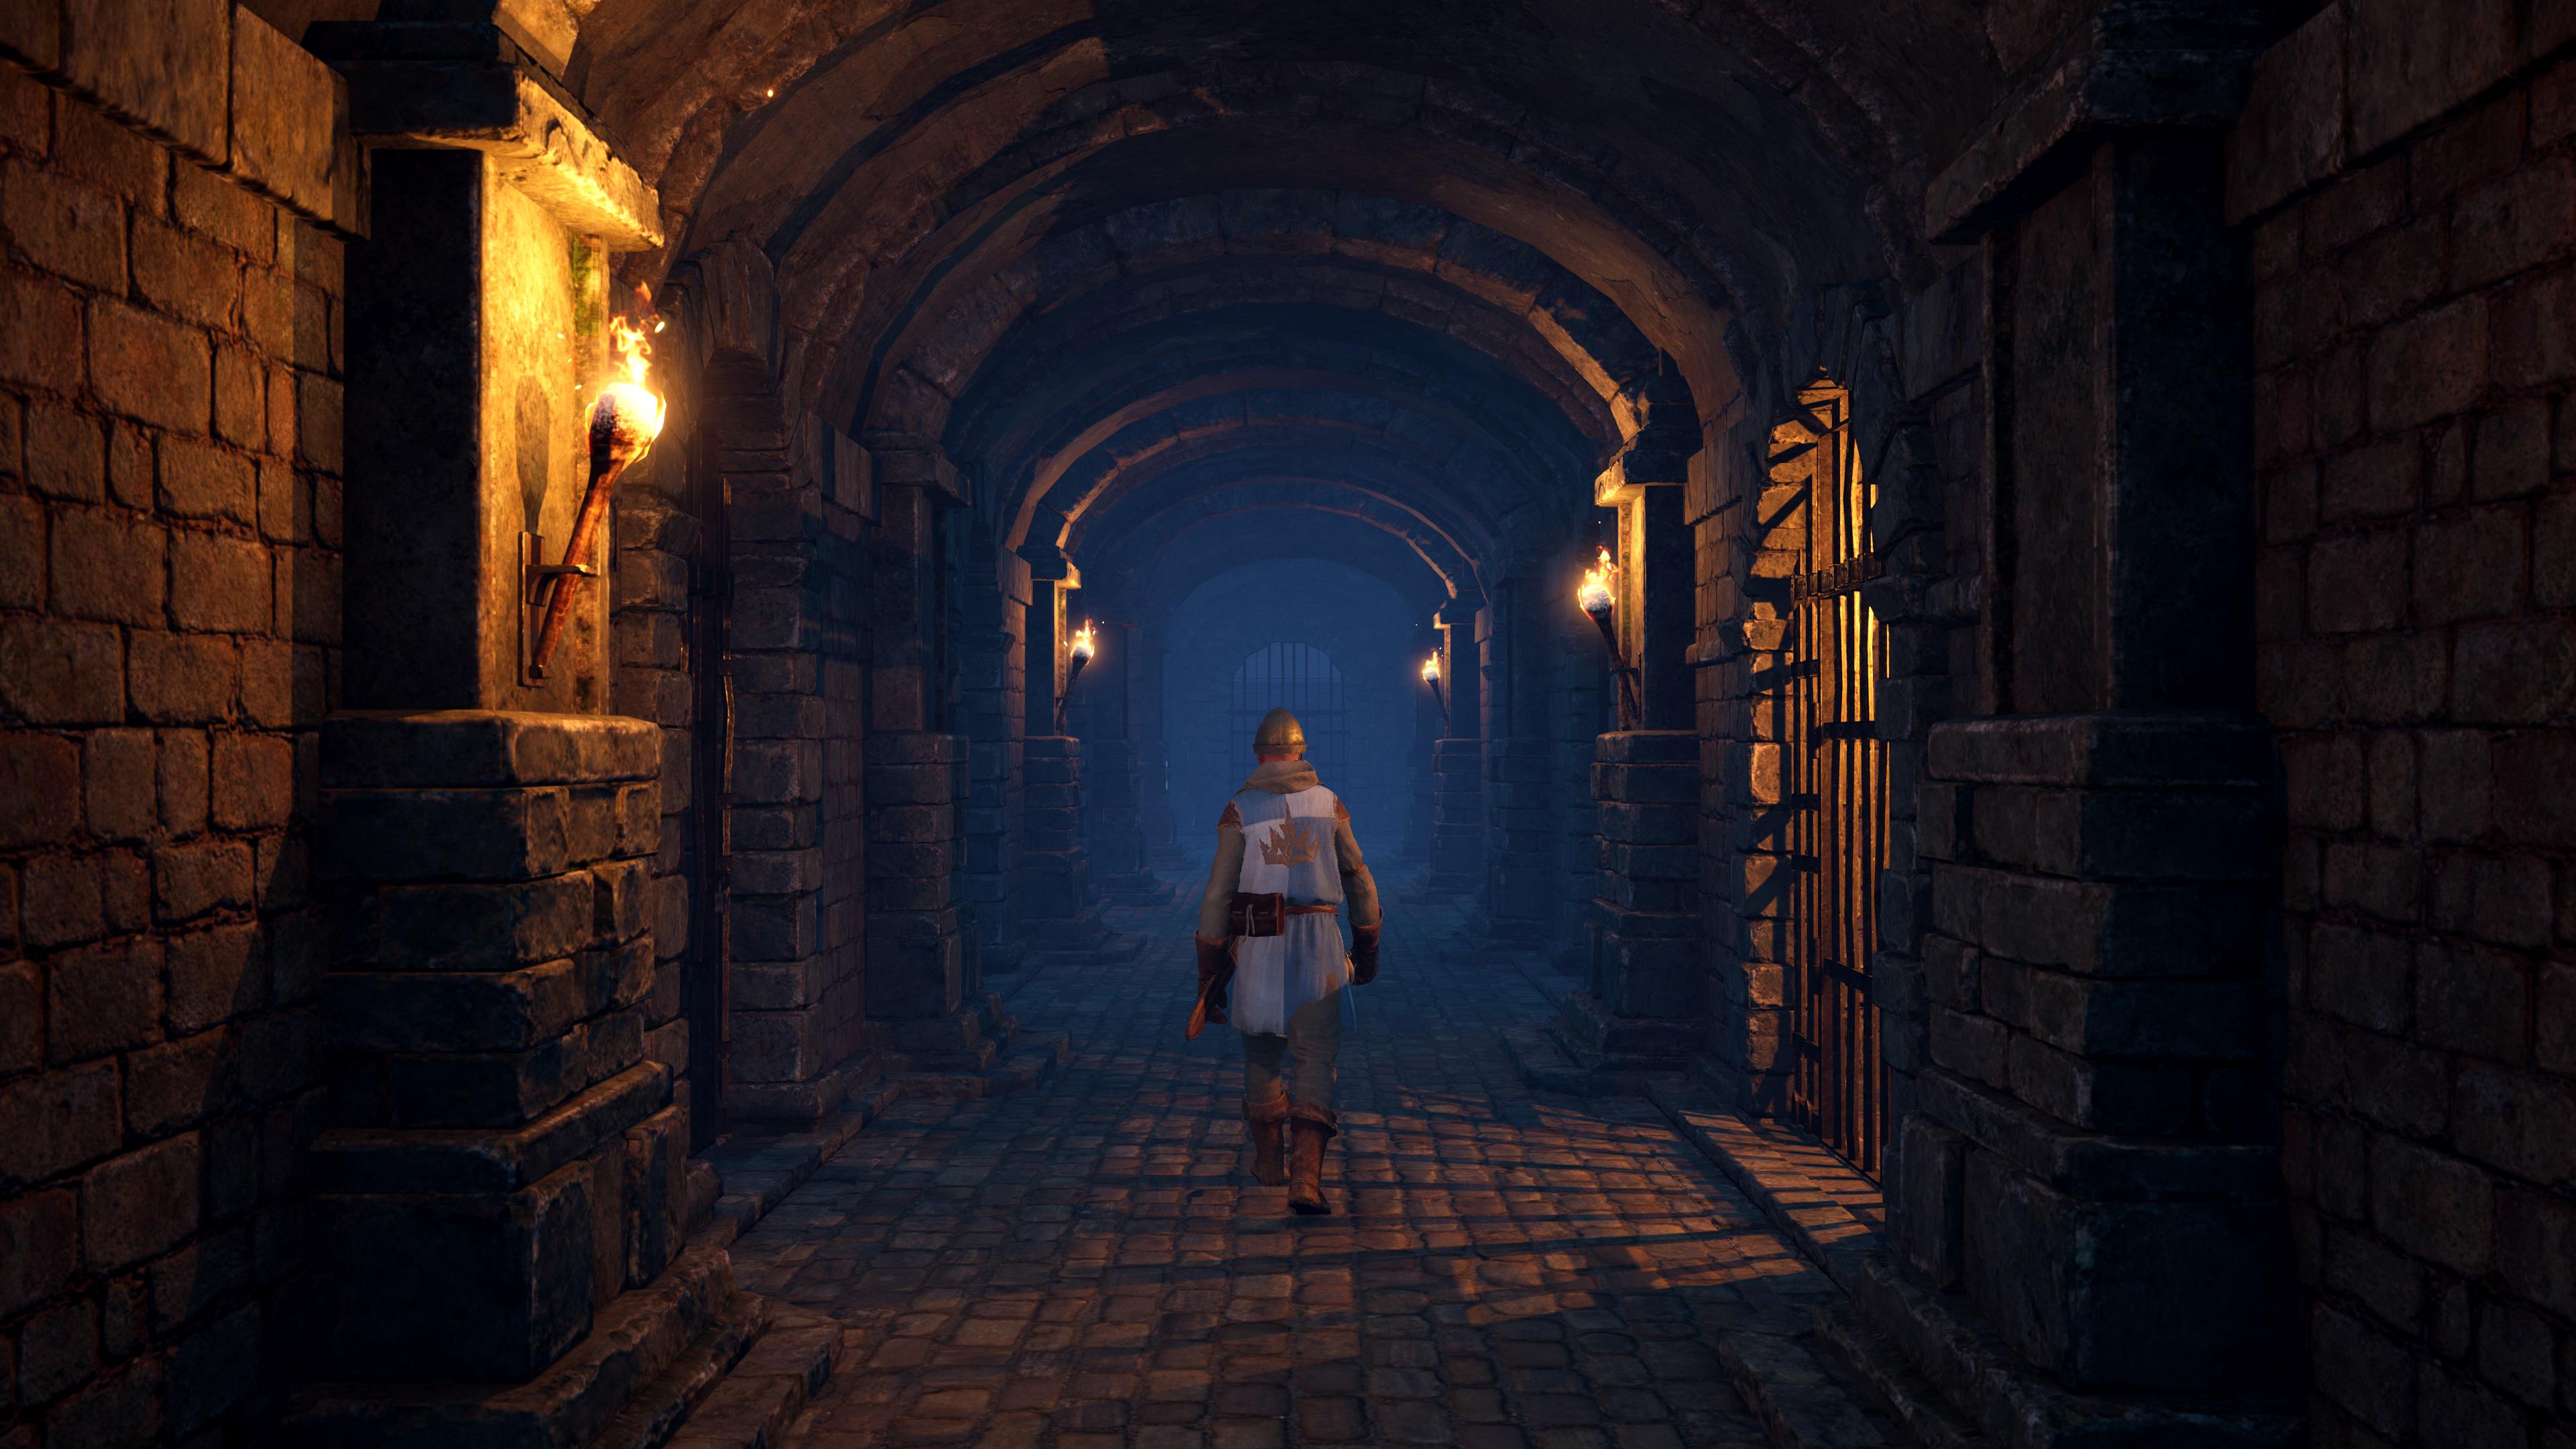 6daad1f04b874ccaf4987c52afff17da1897402b | RPG Jeuxvidéo